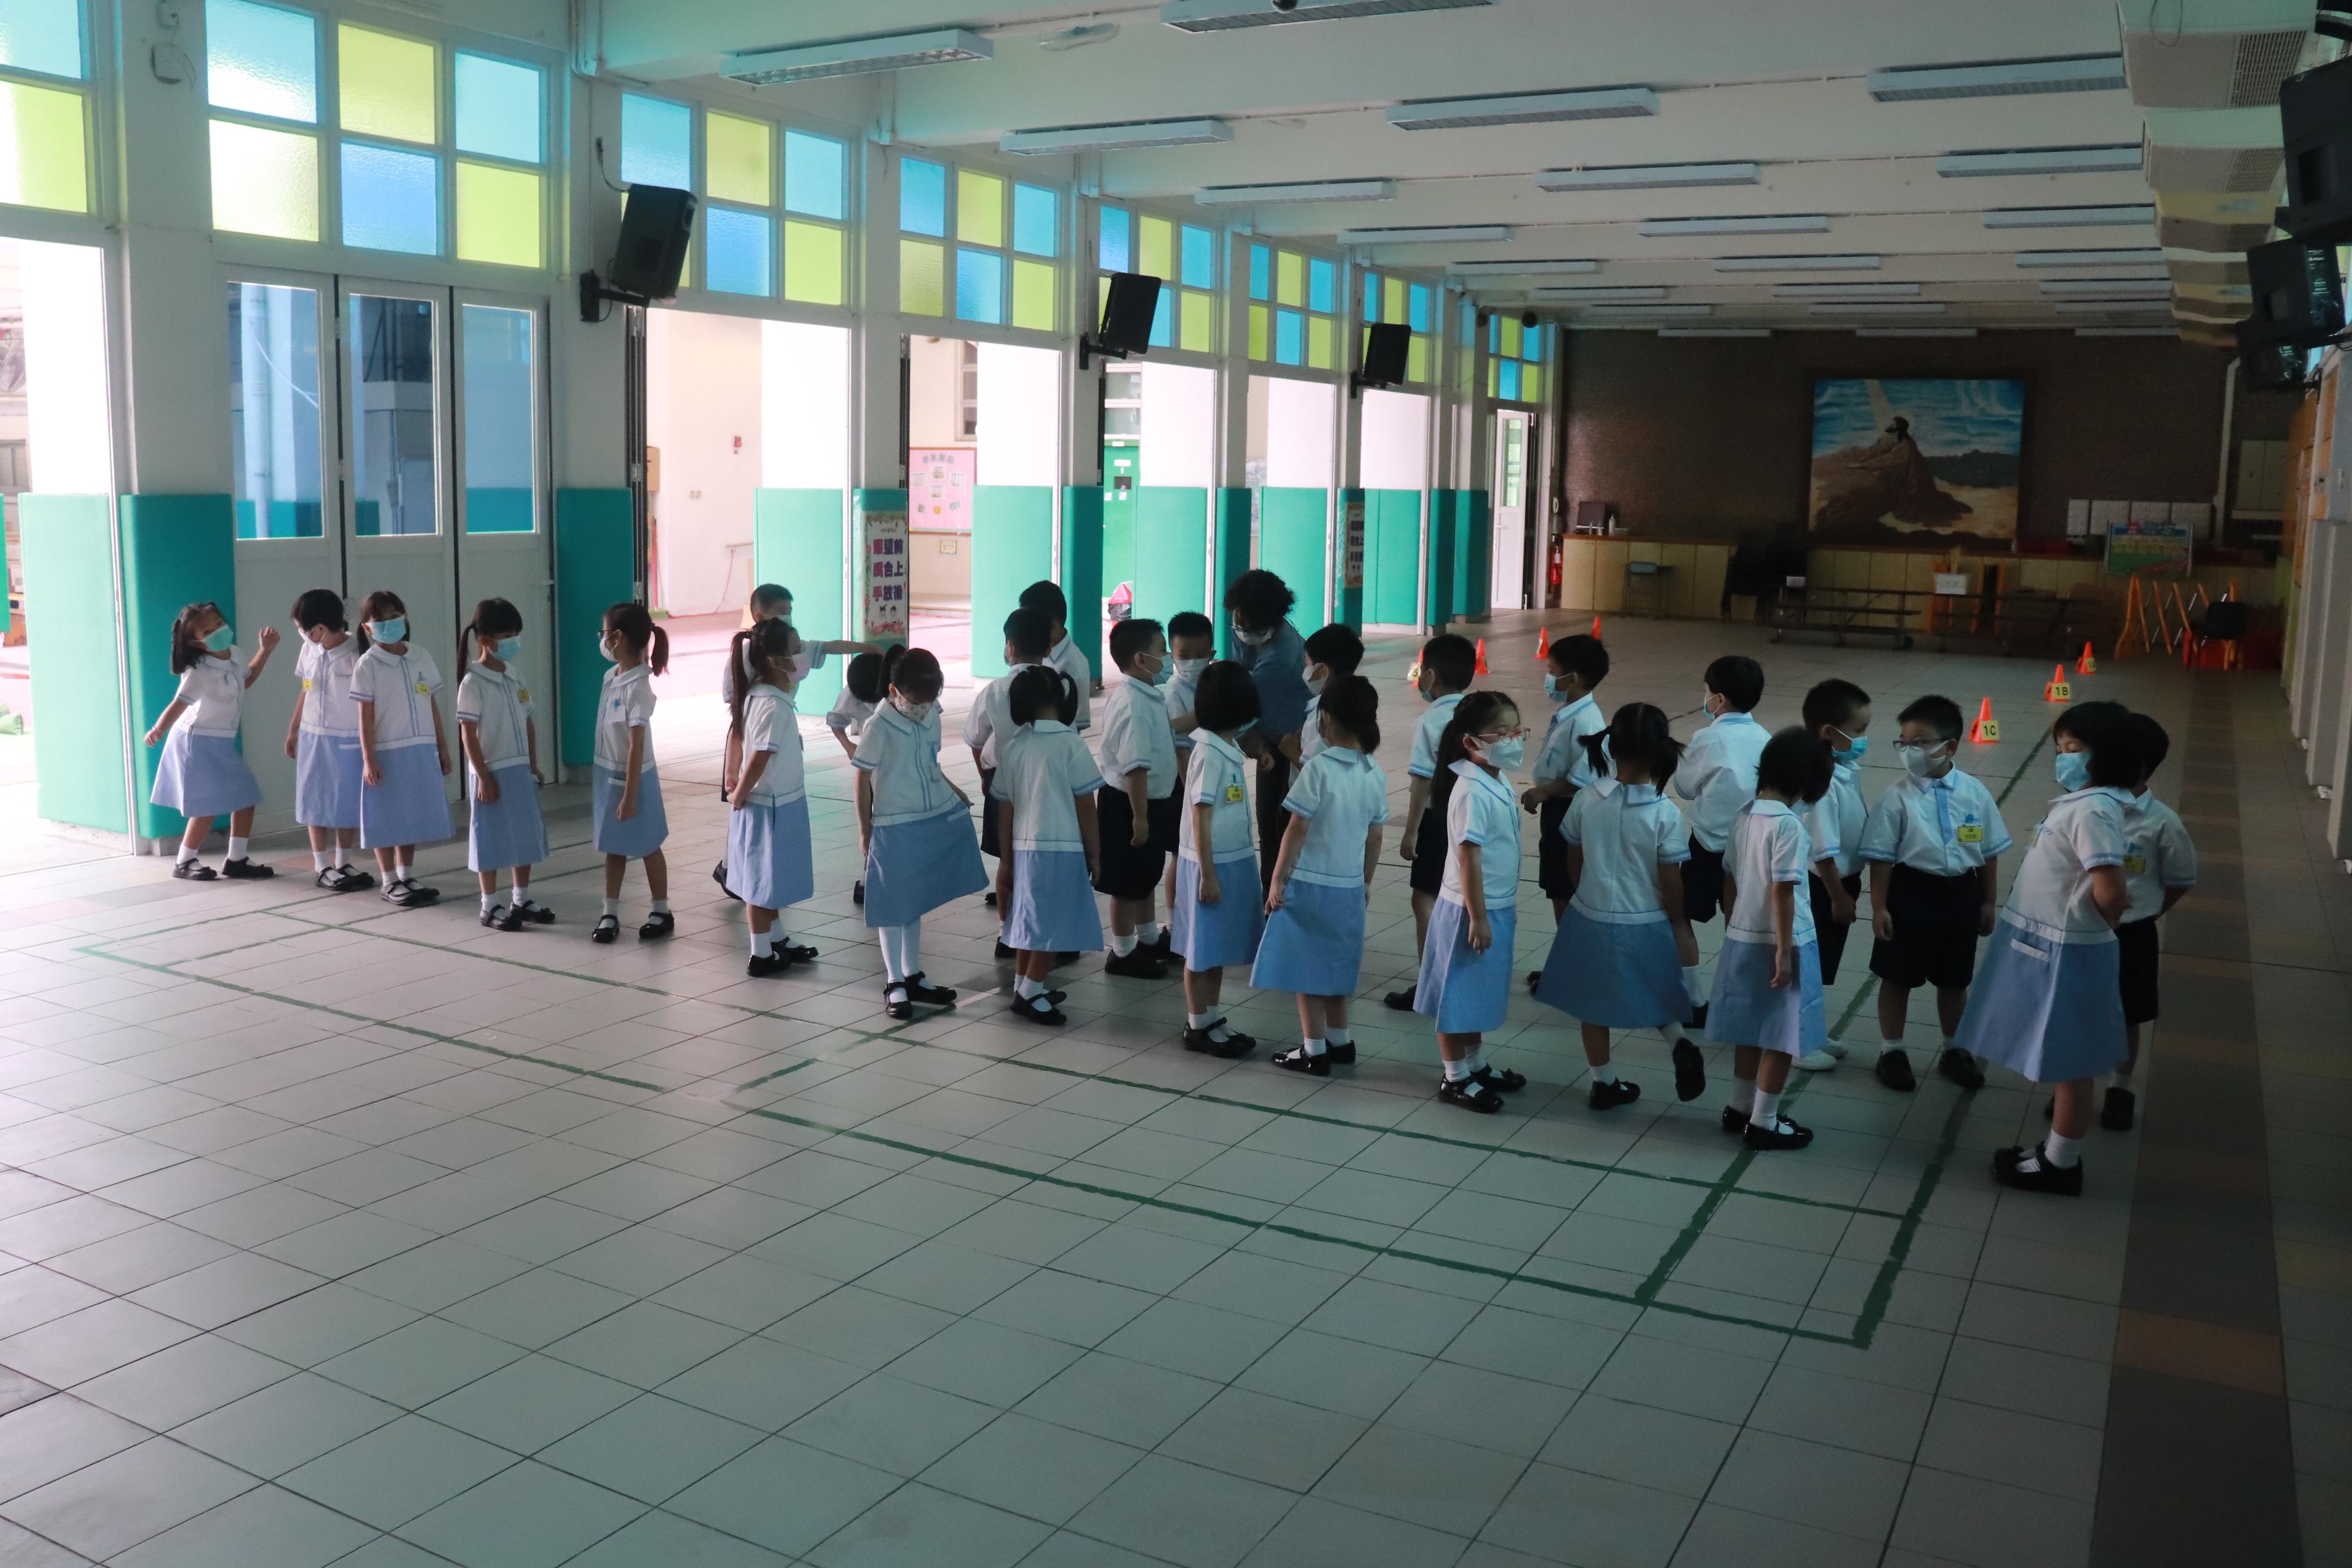 http://keito.school.hk/sites/default/files/img_6106.jpg